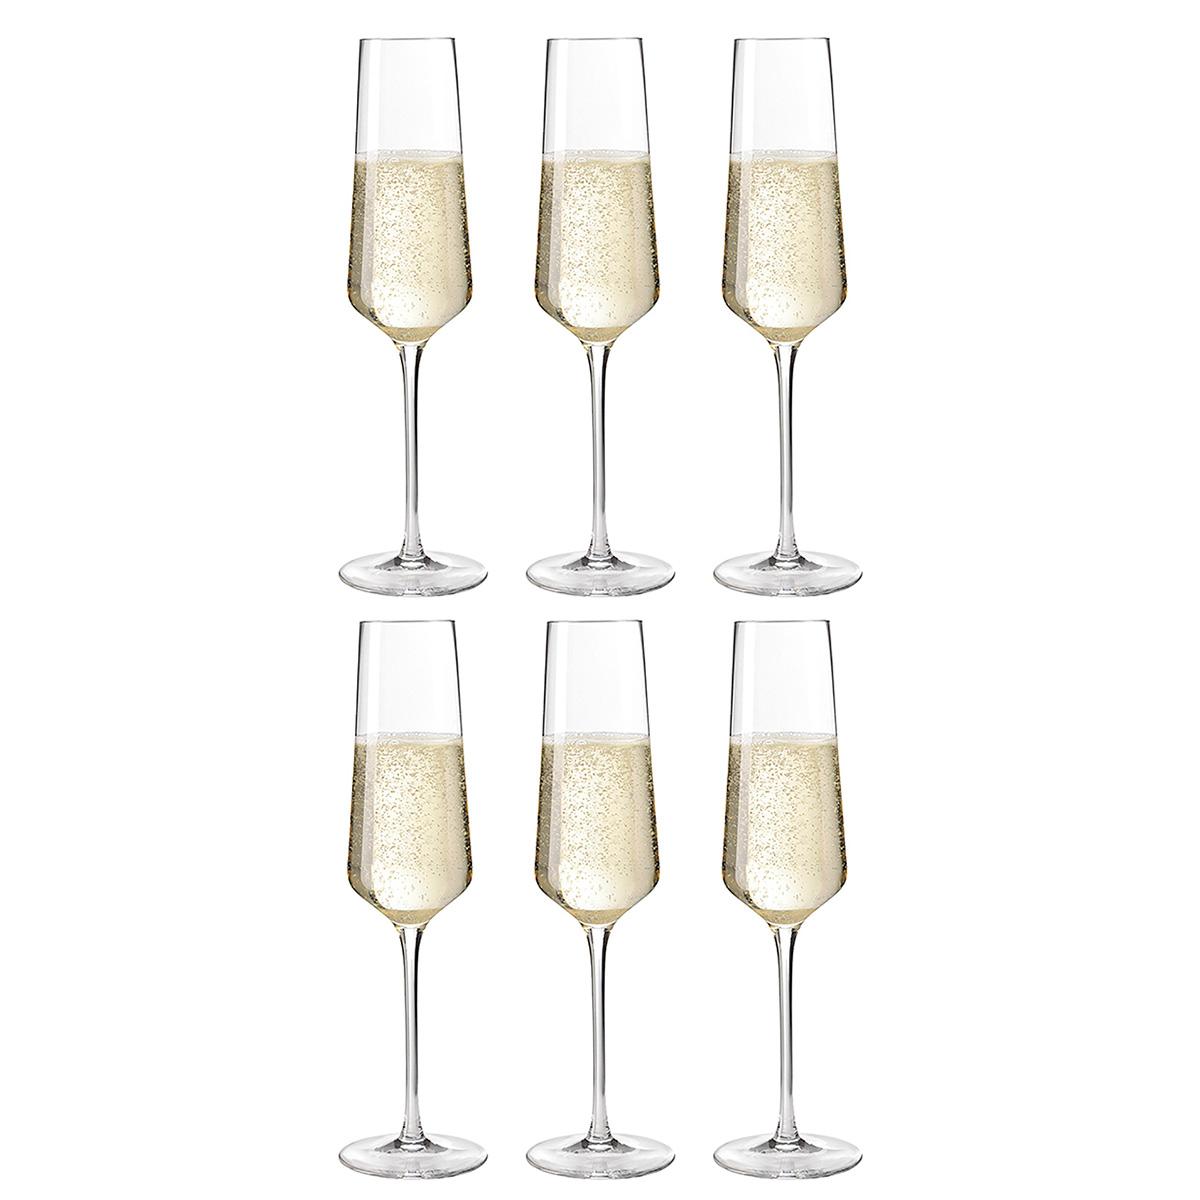 Image of   Leonardo champagneglas - Puccini - 6 stk.